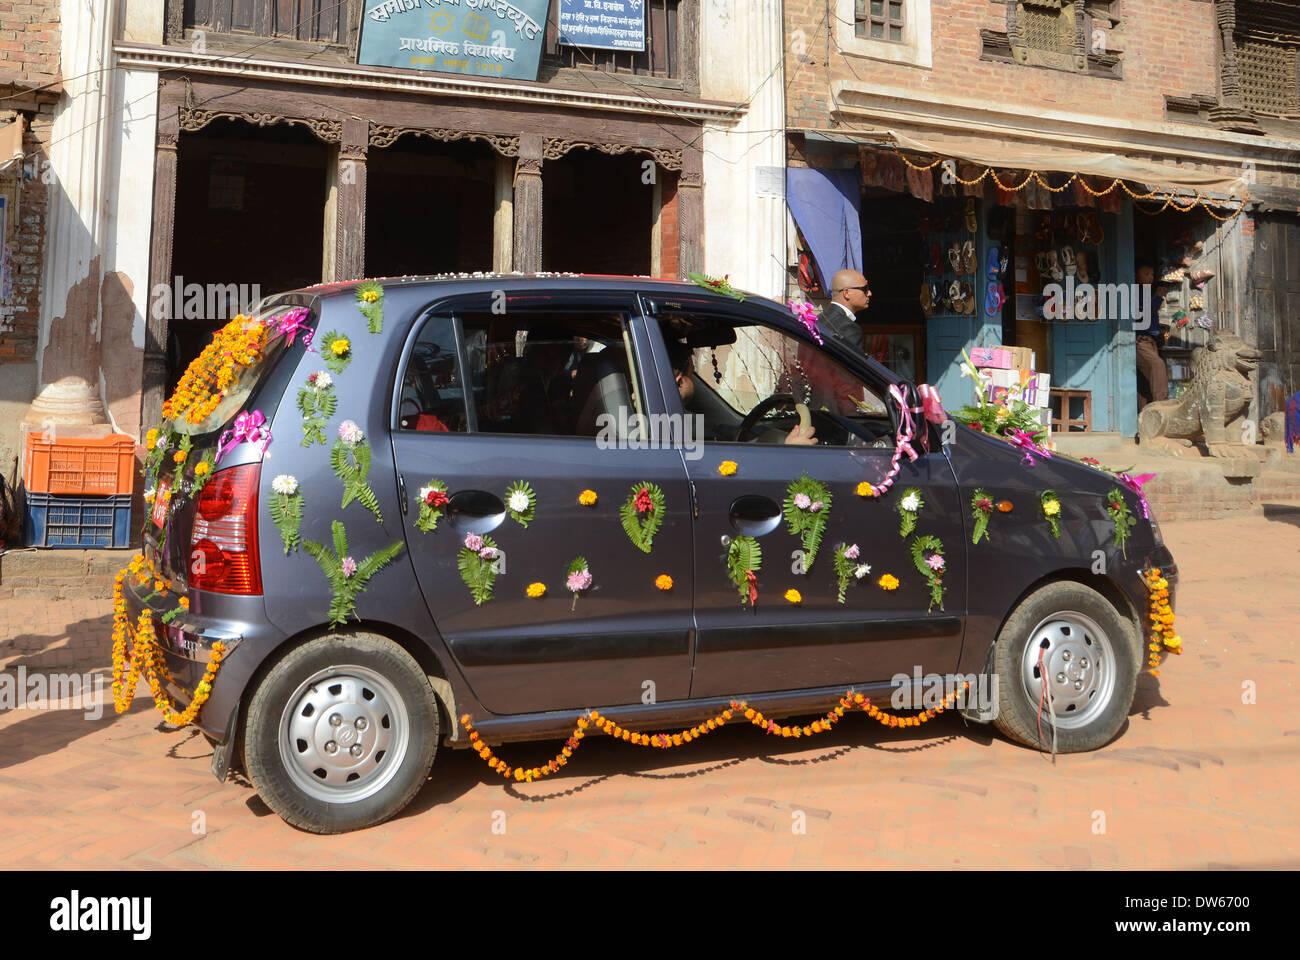 Car decoration in wedding parade dattatraya square bhaktapur nepal car decoration in wedding parade dattatraya square bhaktapur nepal junglespirit Image collections